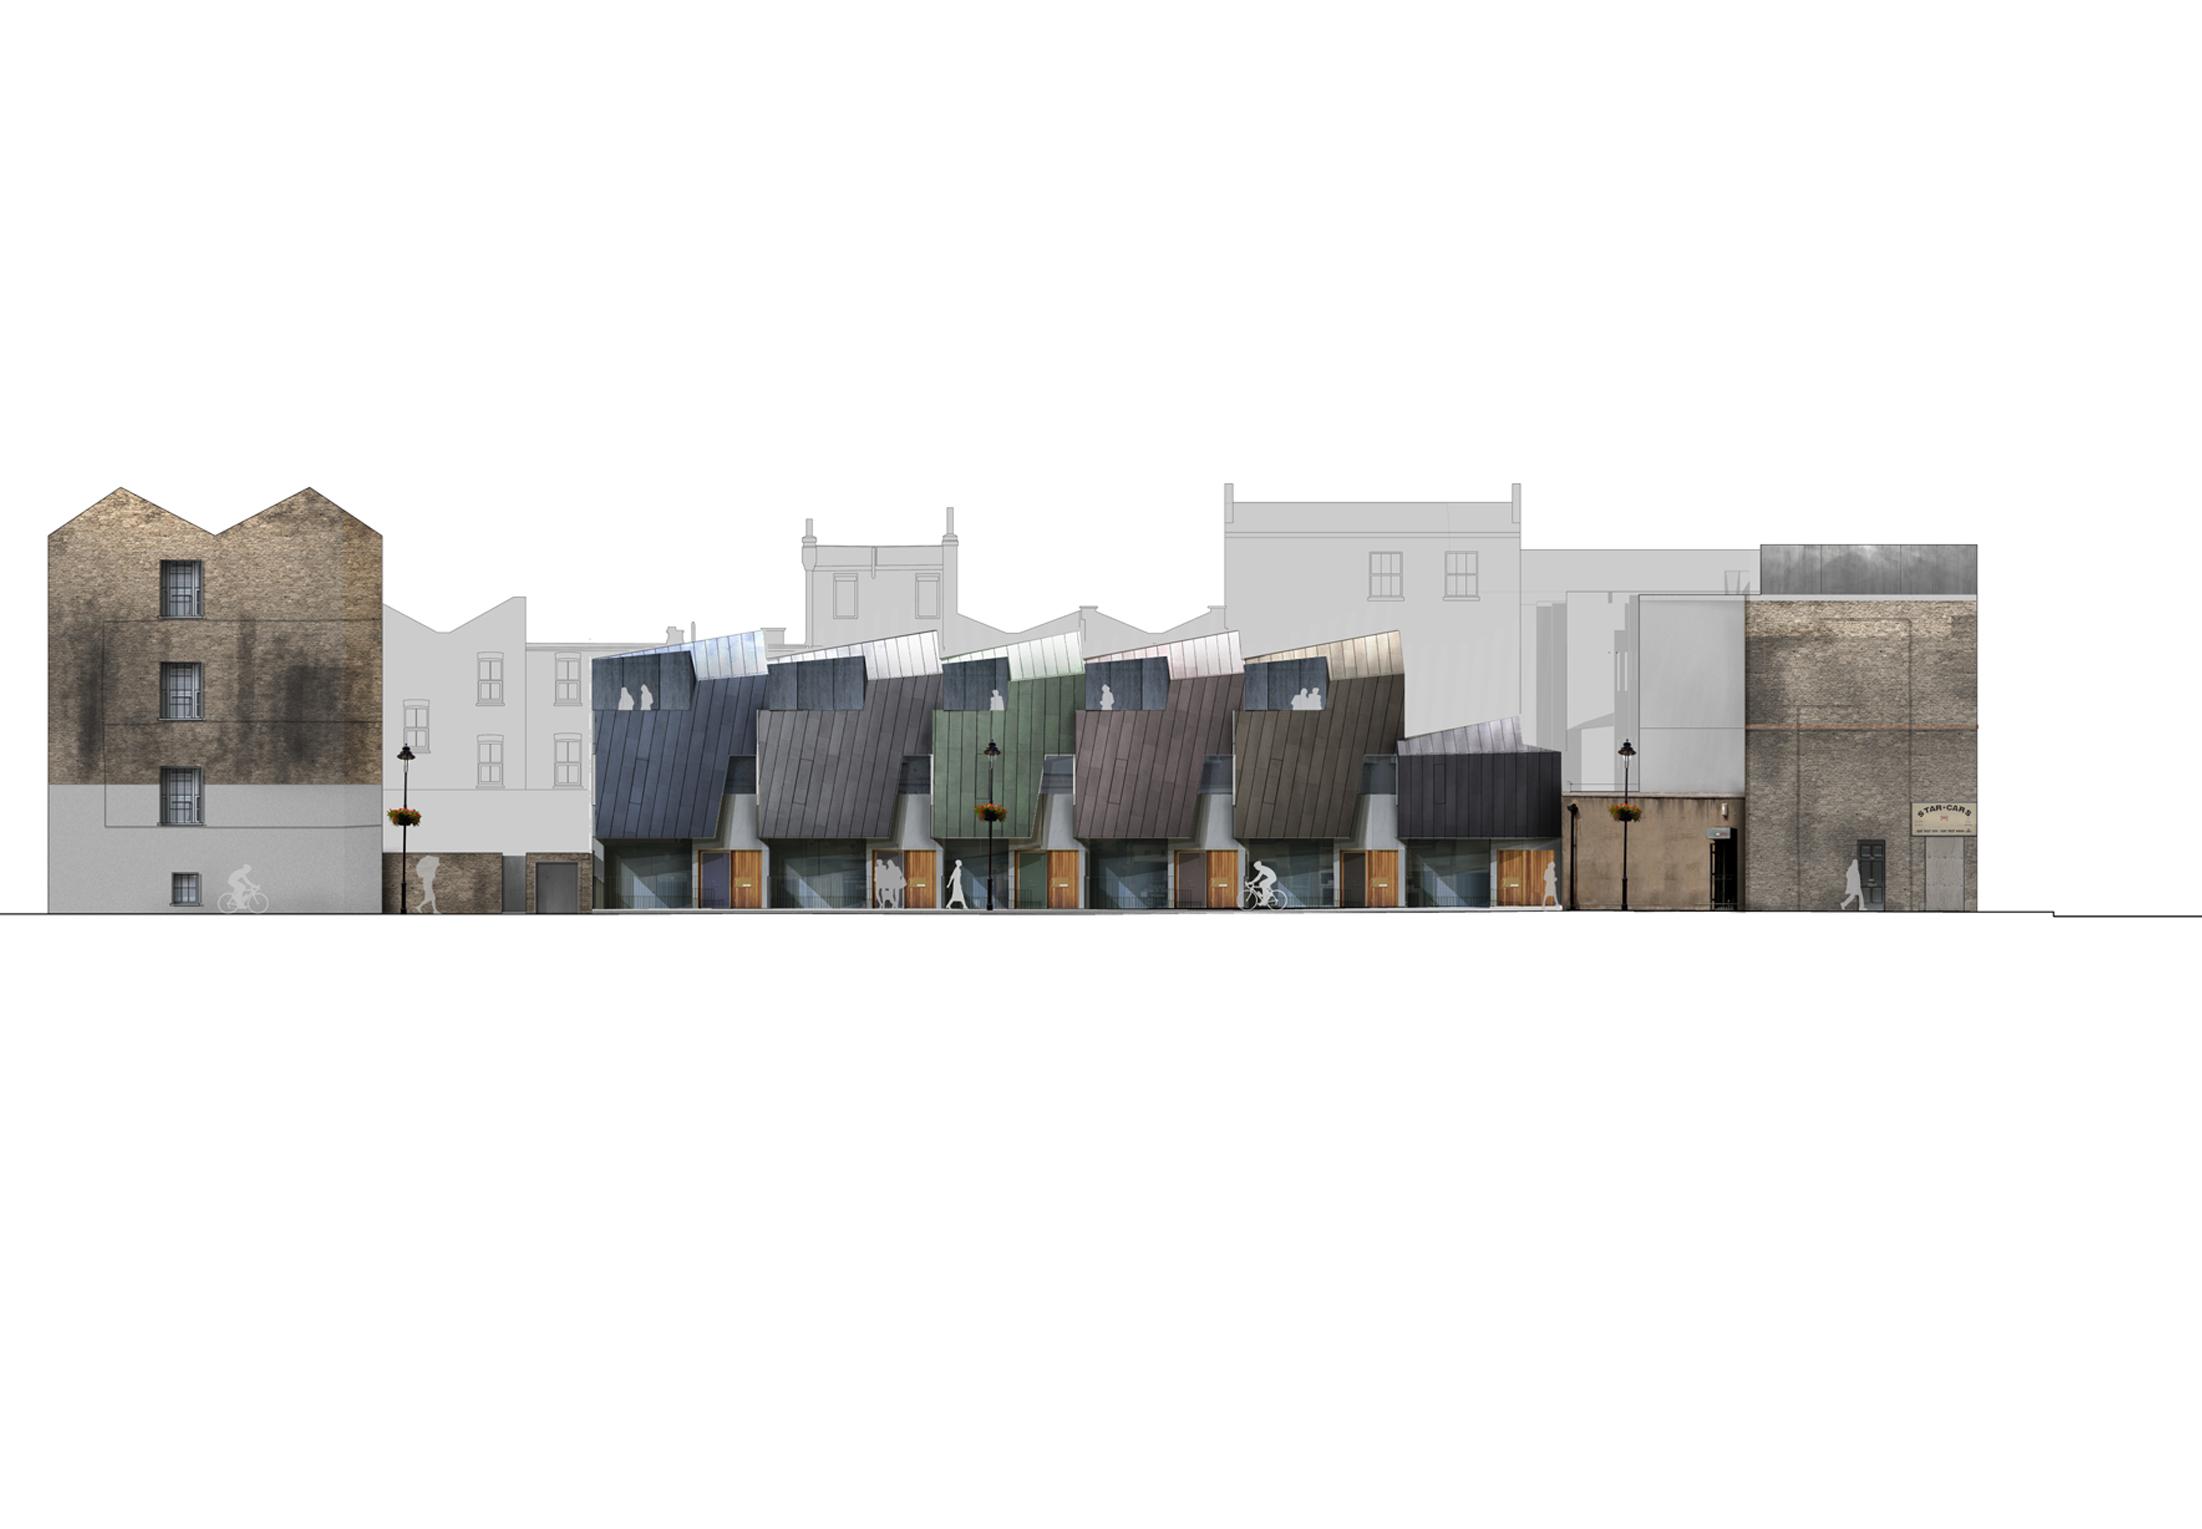 S:\Edgley Design\0904 Godson Street\Drawings\Plotfiles\0904 A1 P